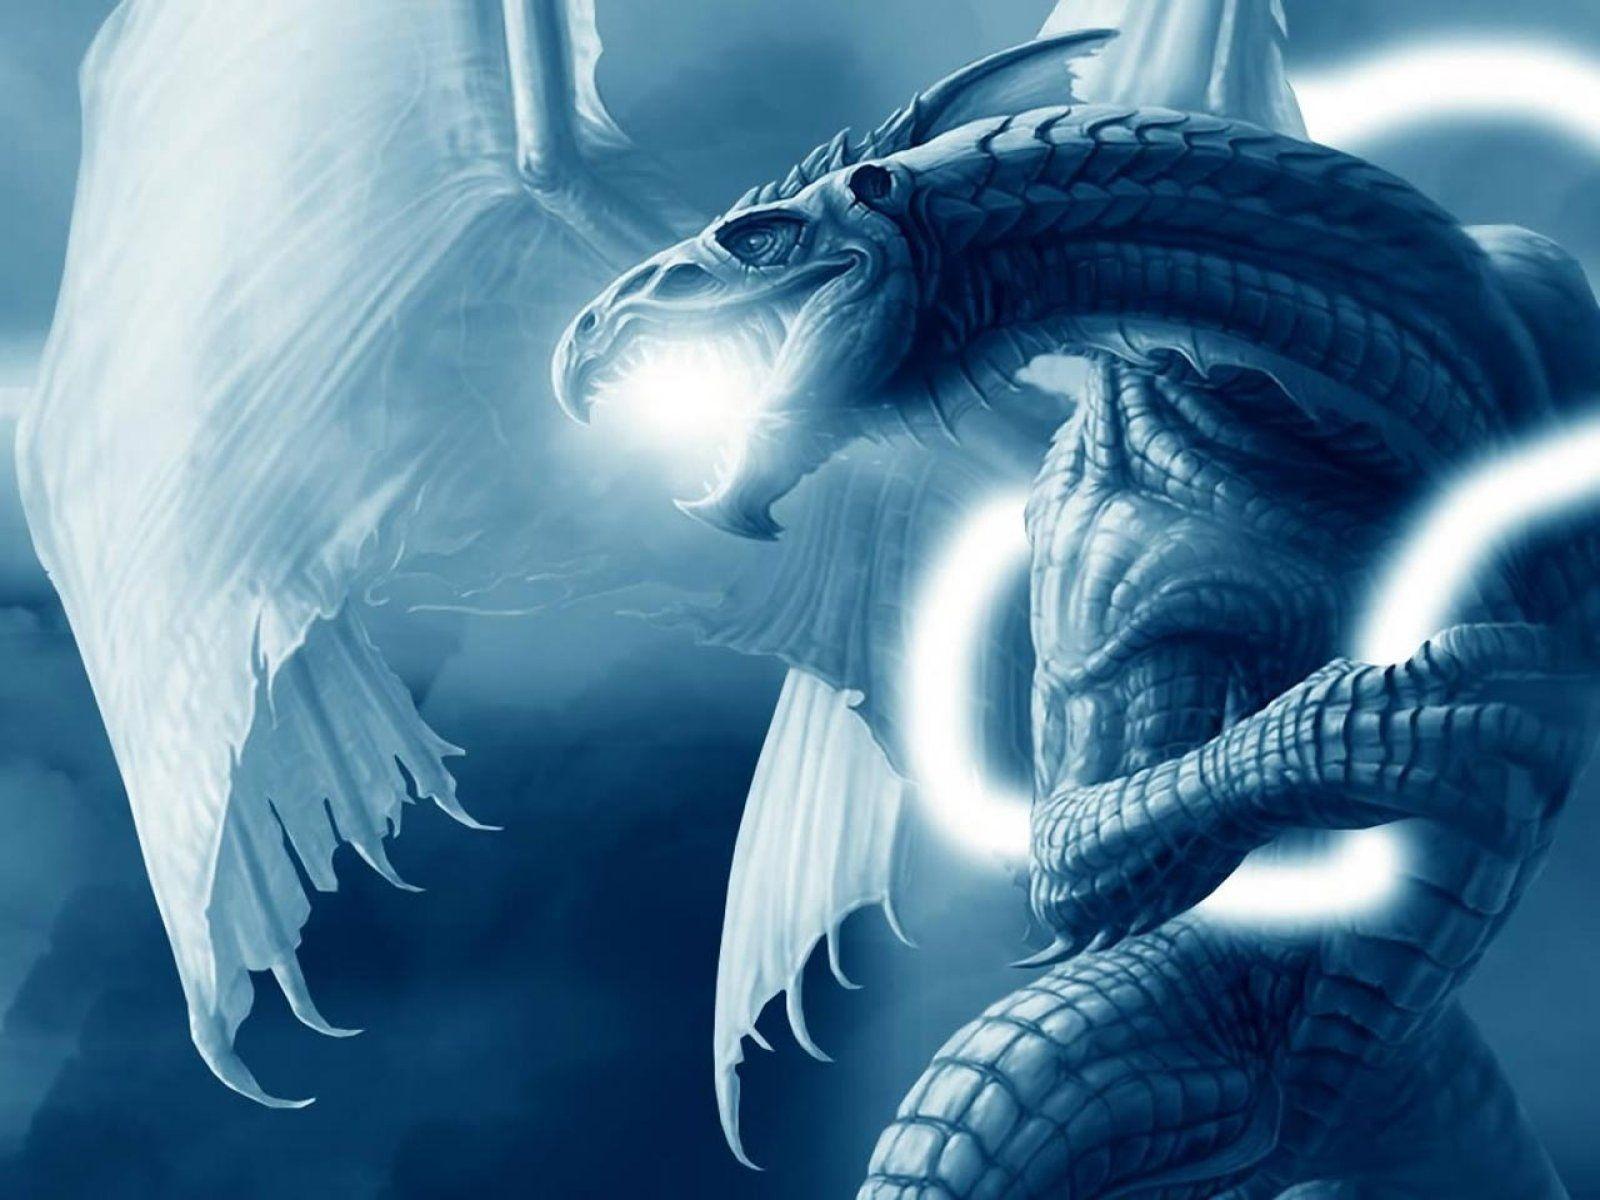 Free Dragon Screensavers And Wallpapers Wallpaper Cave